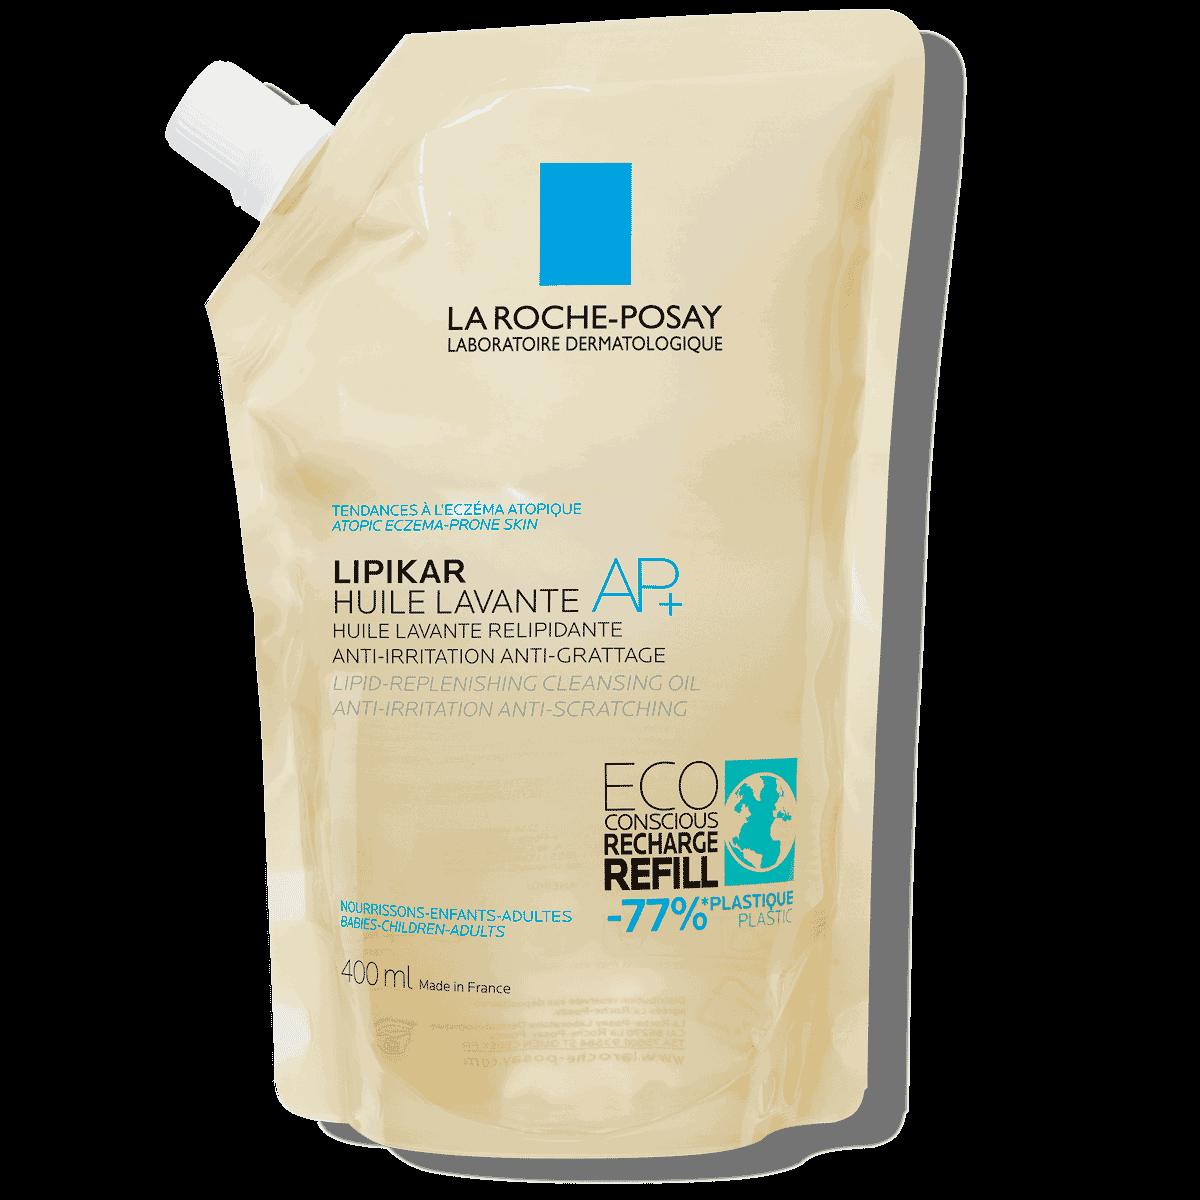 óleo lavante lipikar syndet ap+ eczema e pele atópica